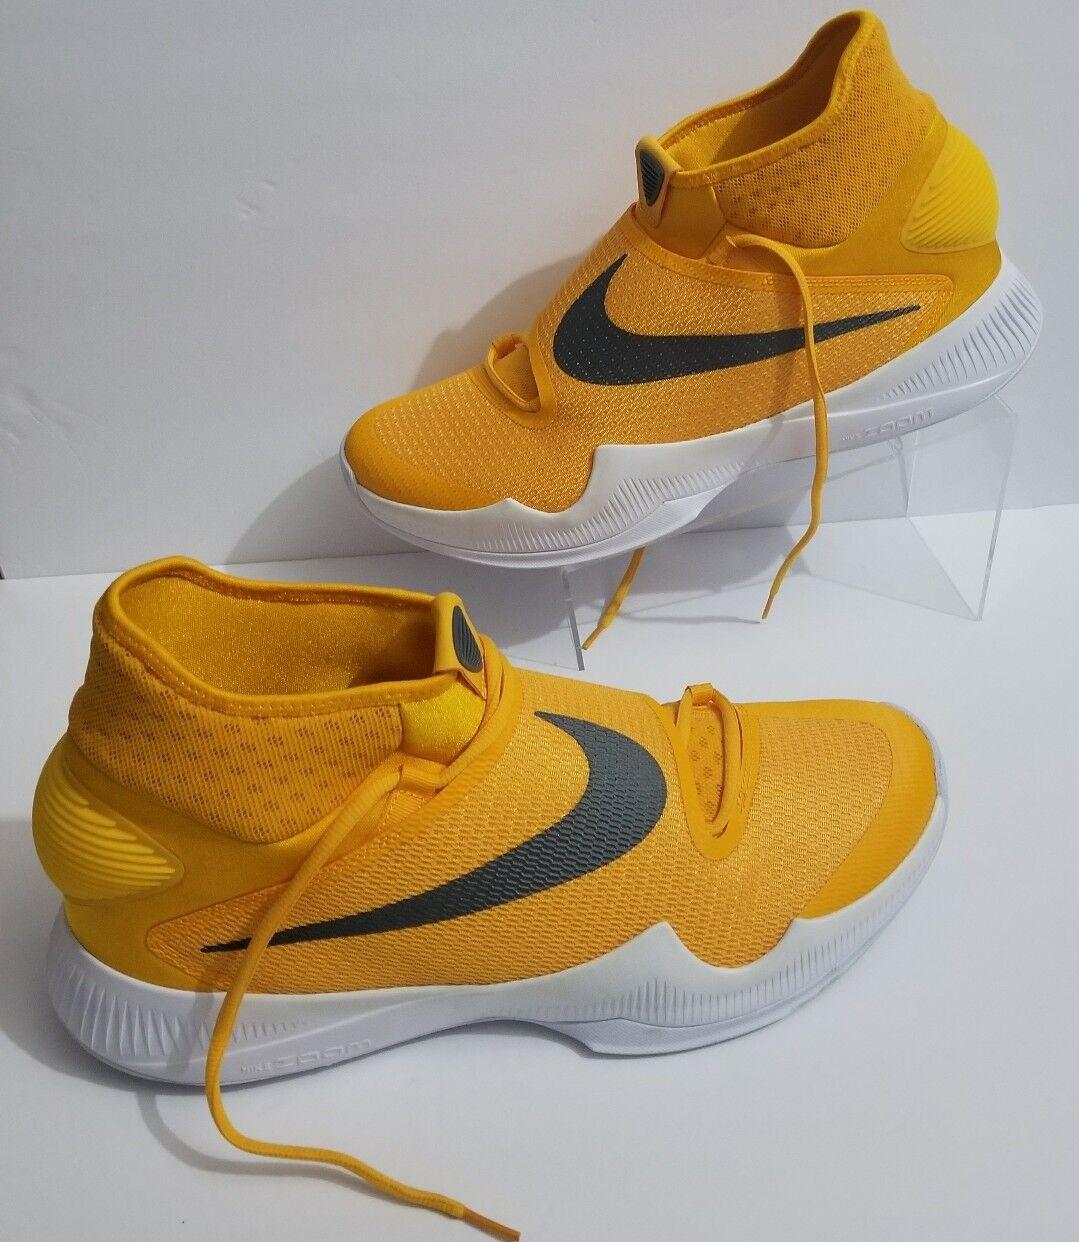 NEW Nike Zoom Hyperrev 2016 University Gold/Gray/White Shoes 835439 702 SZ 15.5